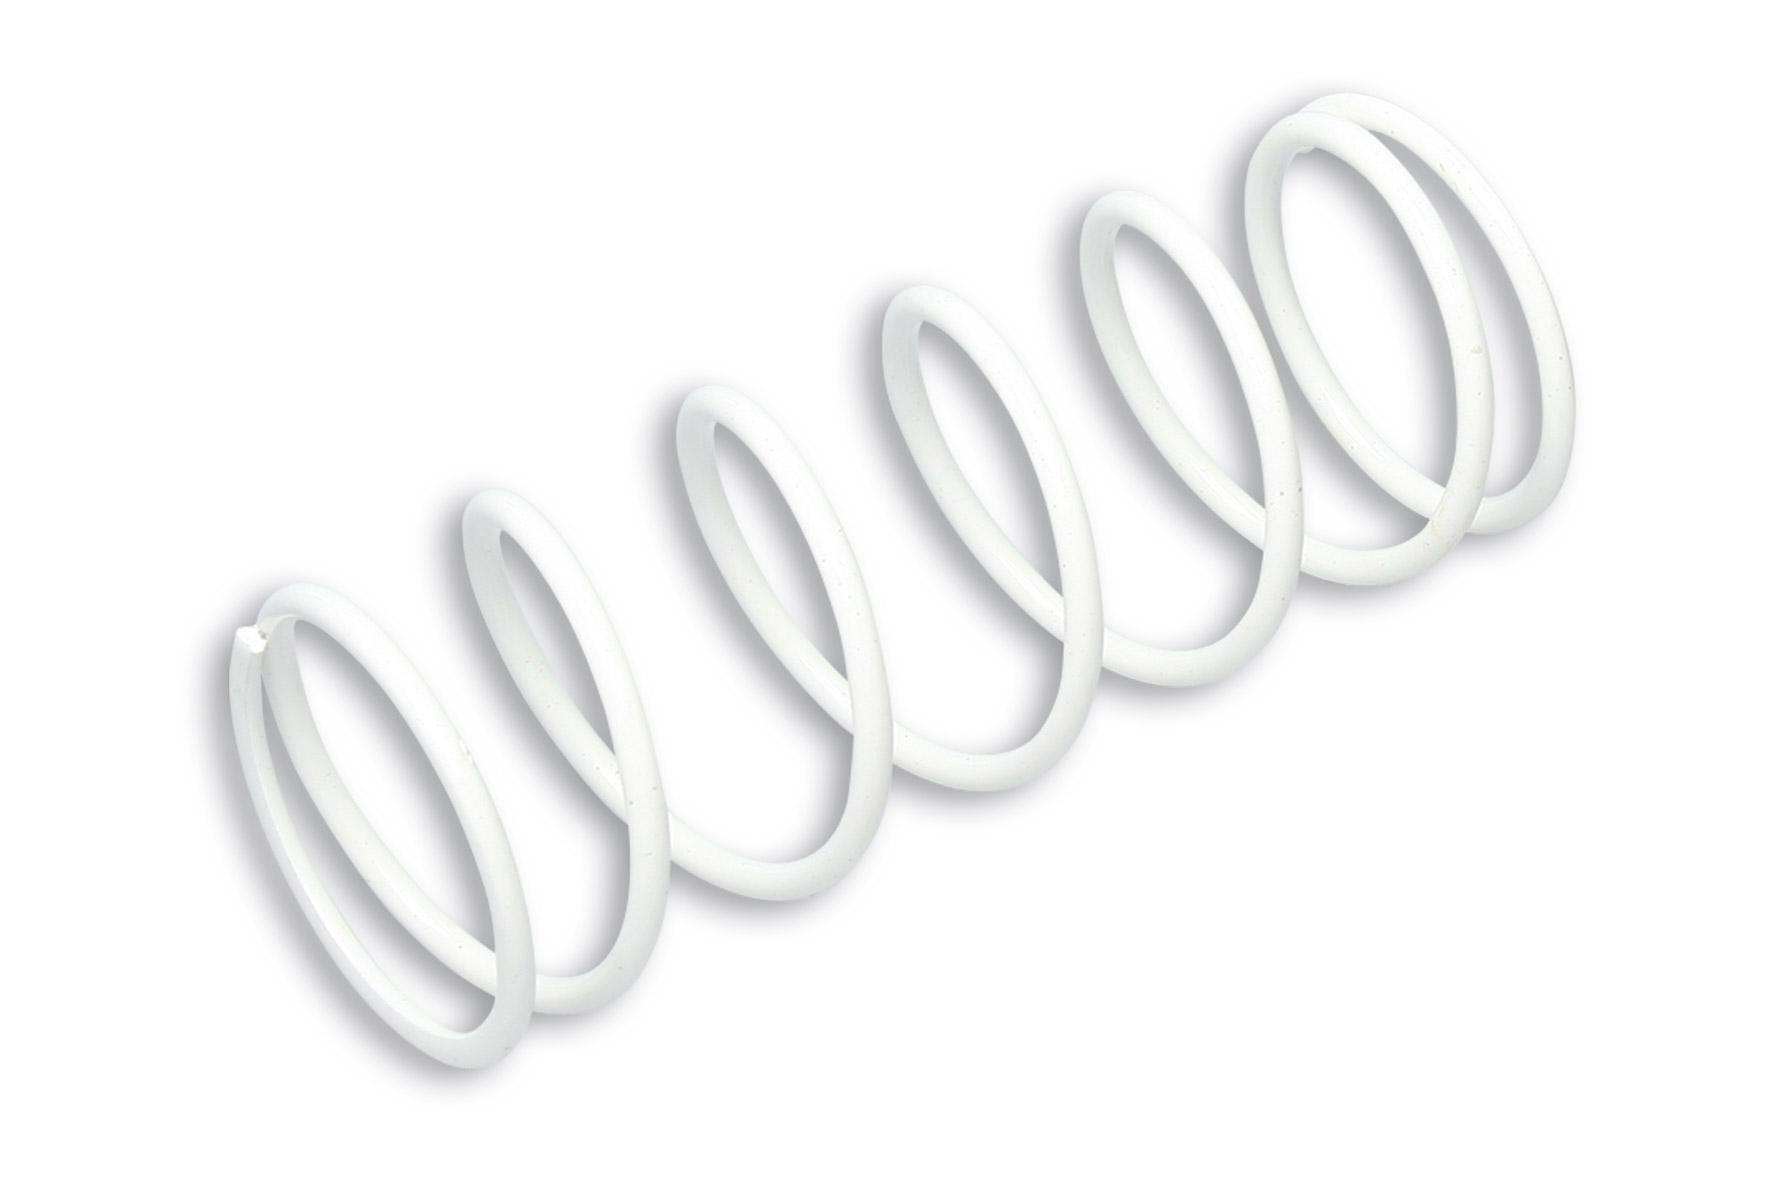 WHITE VARIATOR ADJUSTER SPRING ext.Ø 57,8x150mm thread Ø 4,2mm 4,0k